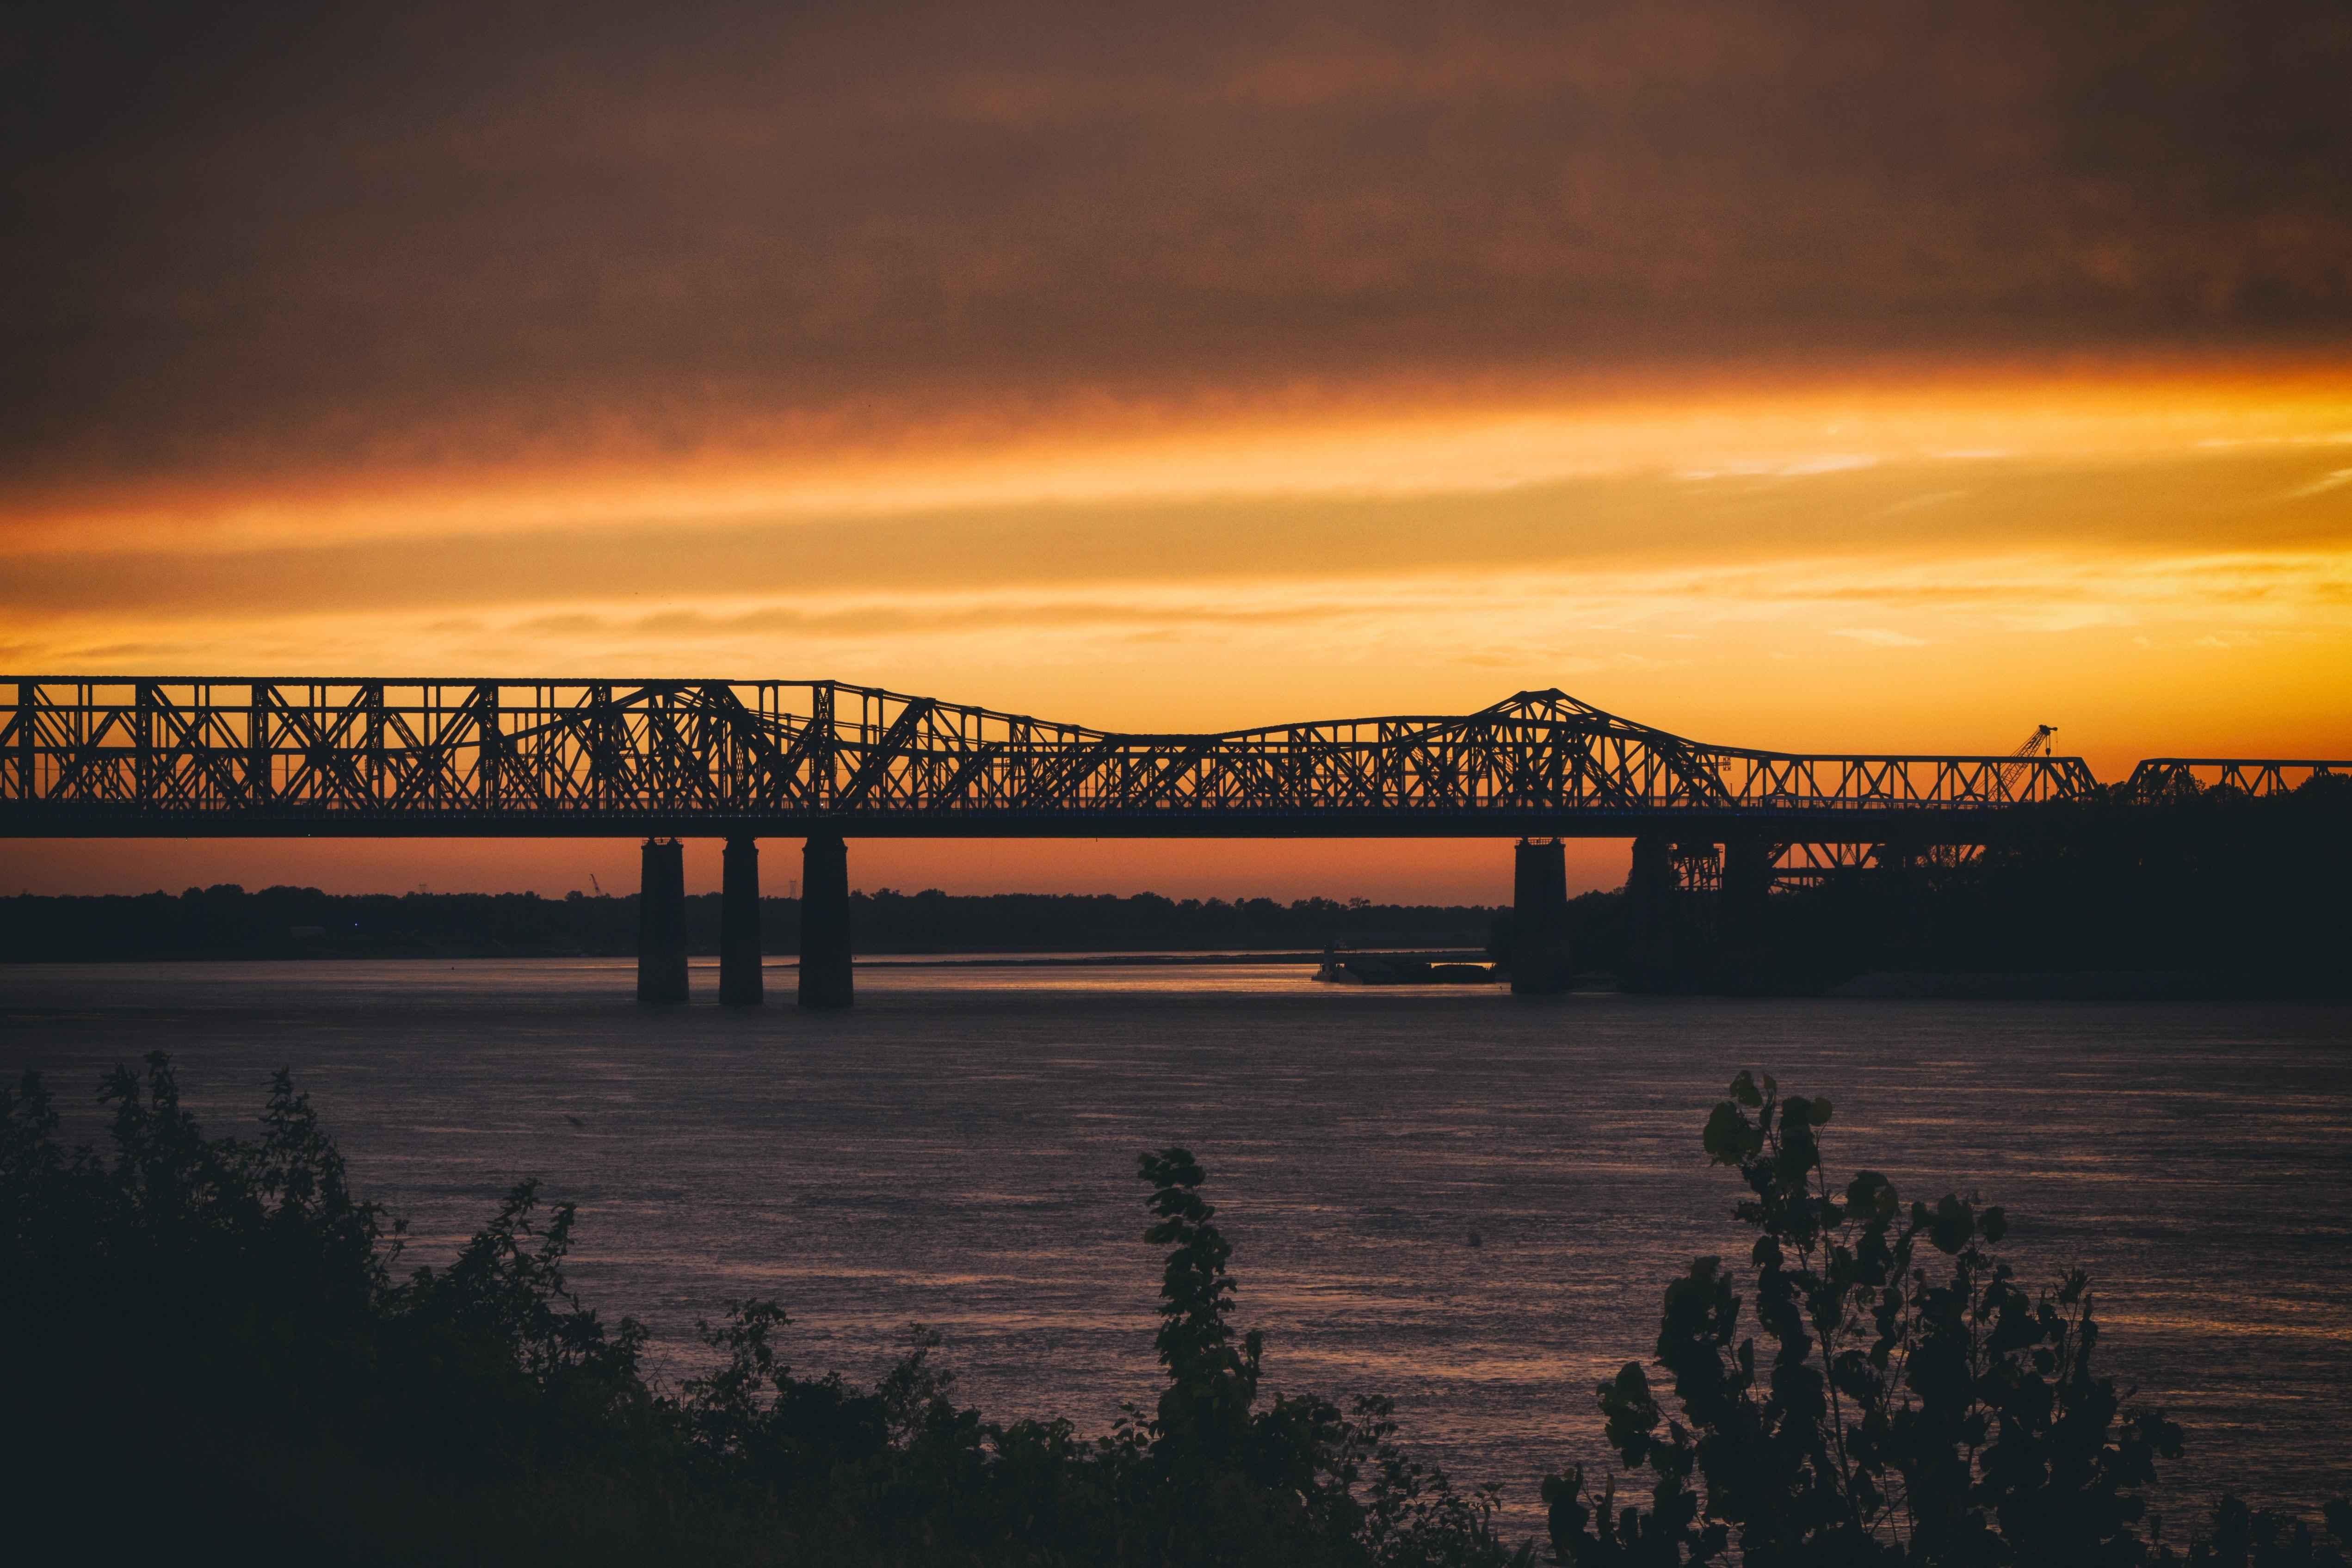 landscape photography of bridge during sunset